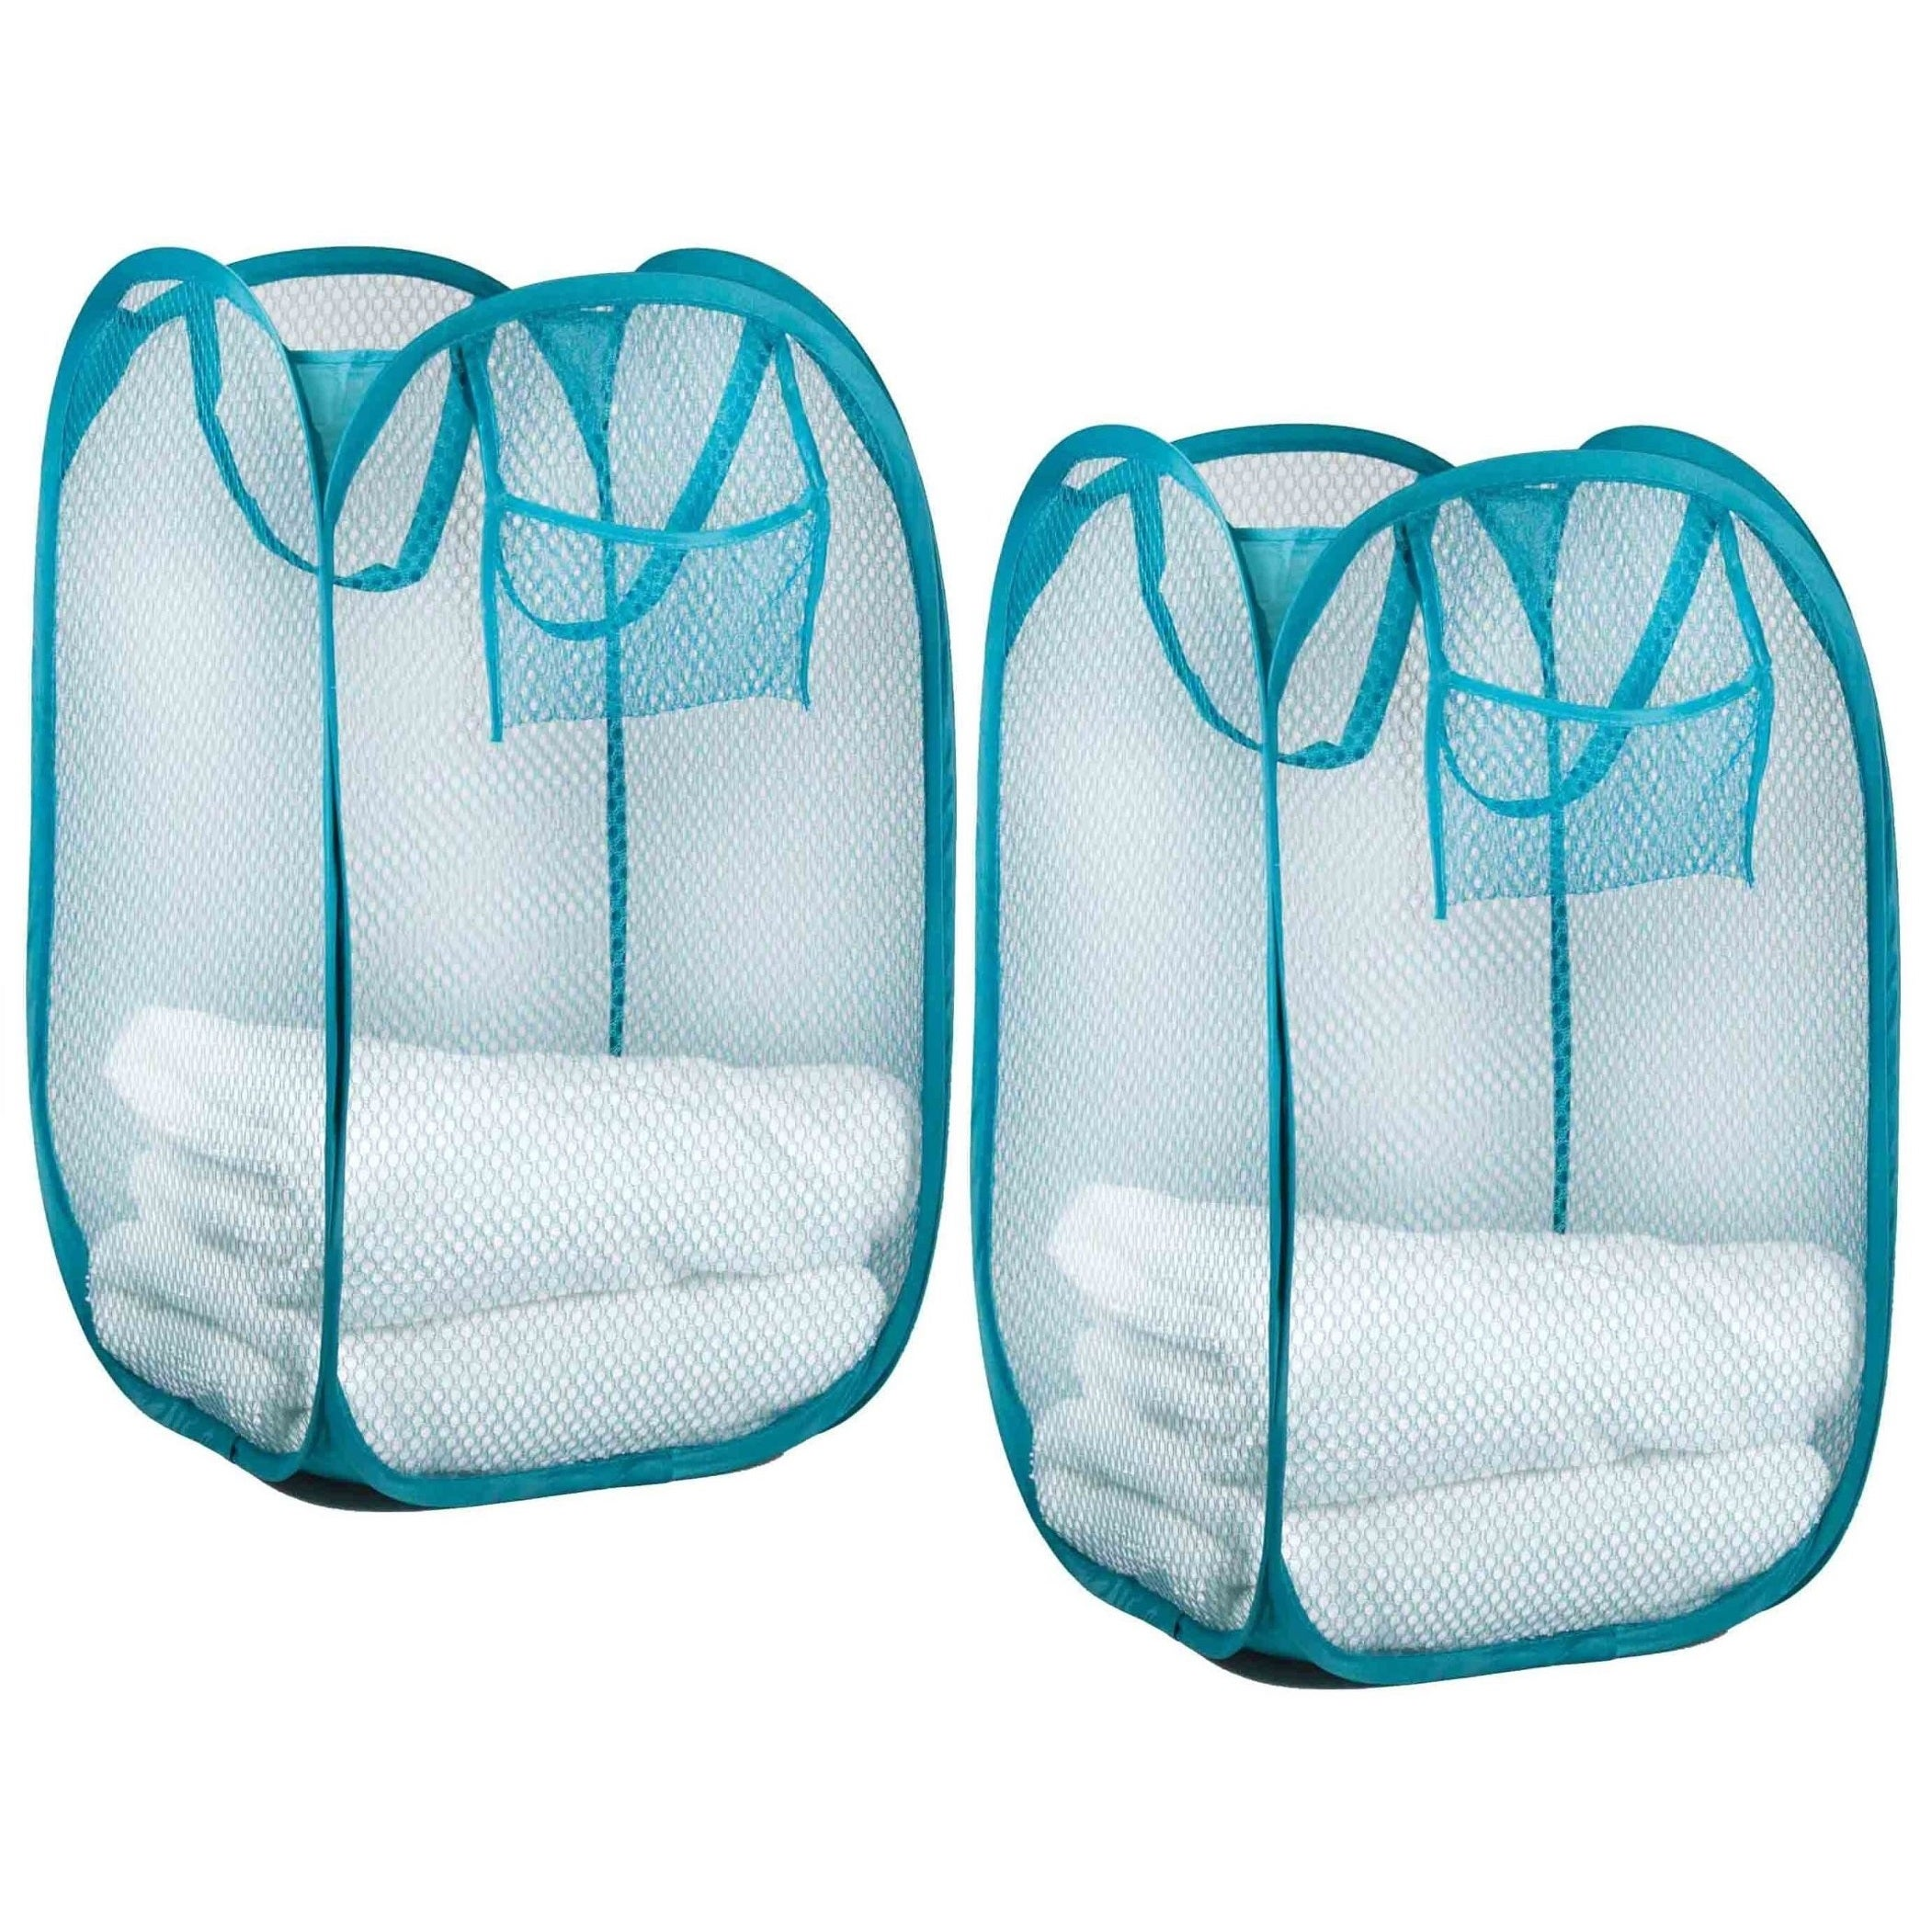 Sunbeam Nylon Mesh Pop-up Laundry Hamper with Carry Handles (Set of ...